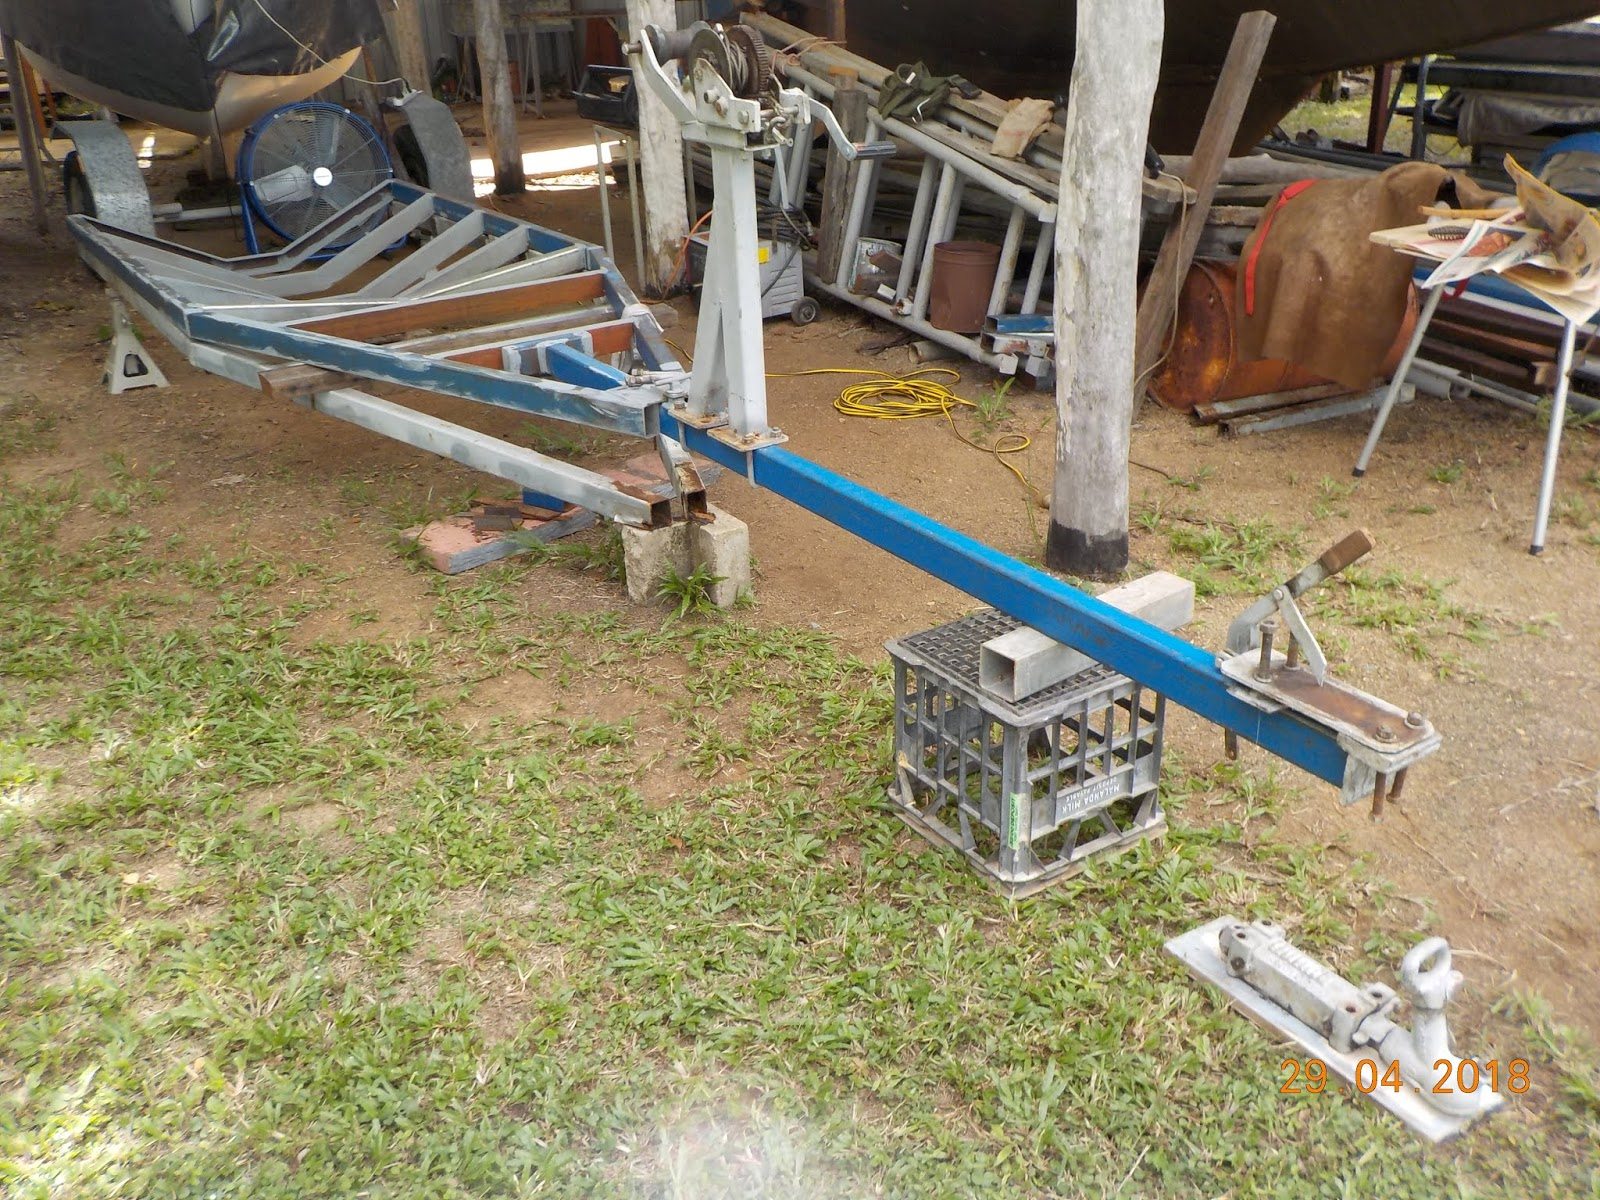 waterways trailer frame rebuild 6 and draw bar